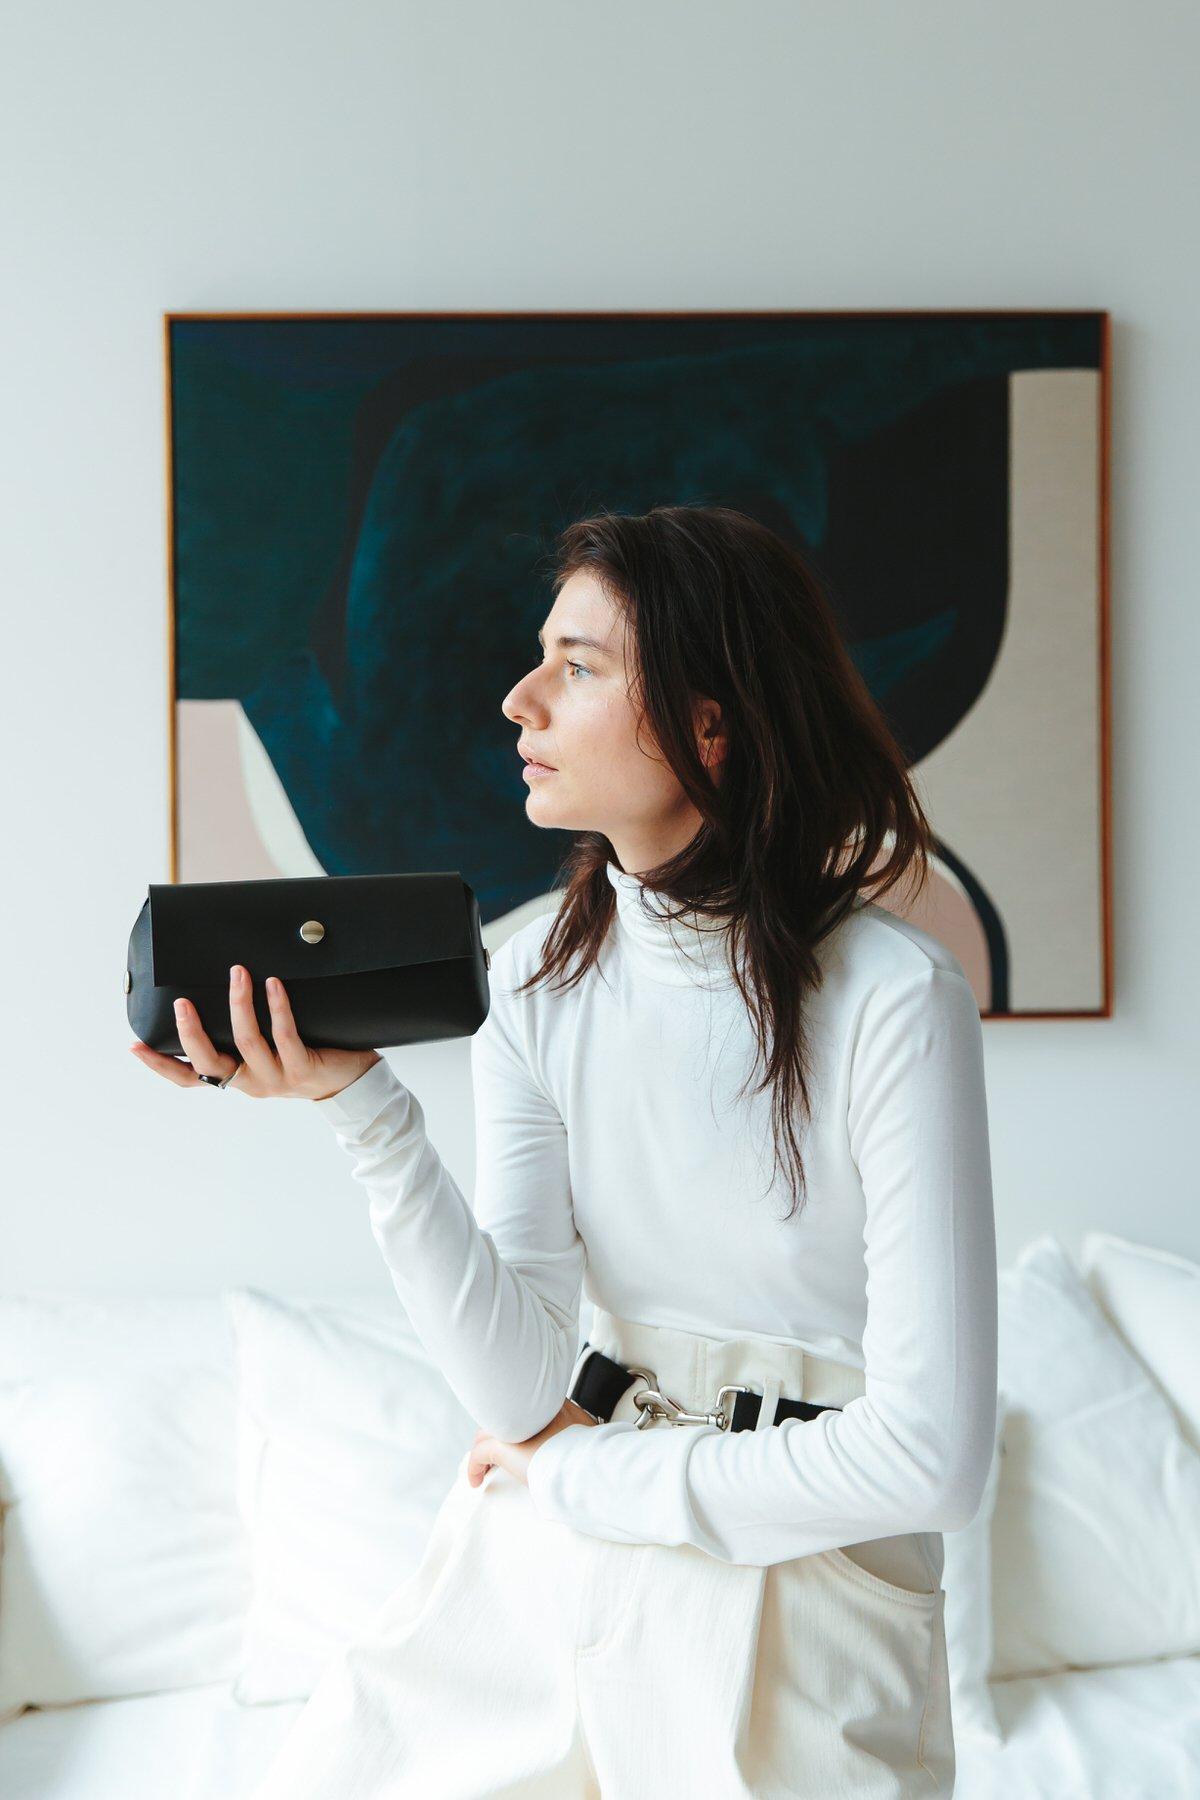 Designer Katya Komarova holding one of her designs